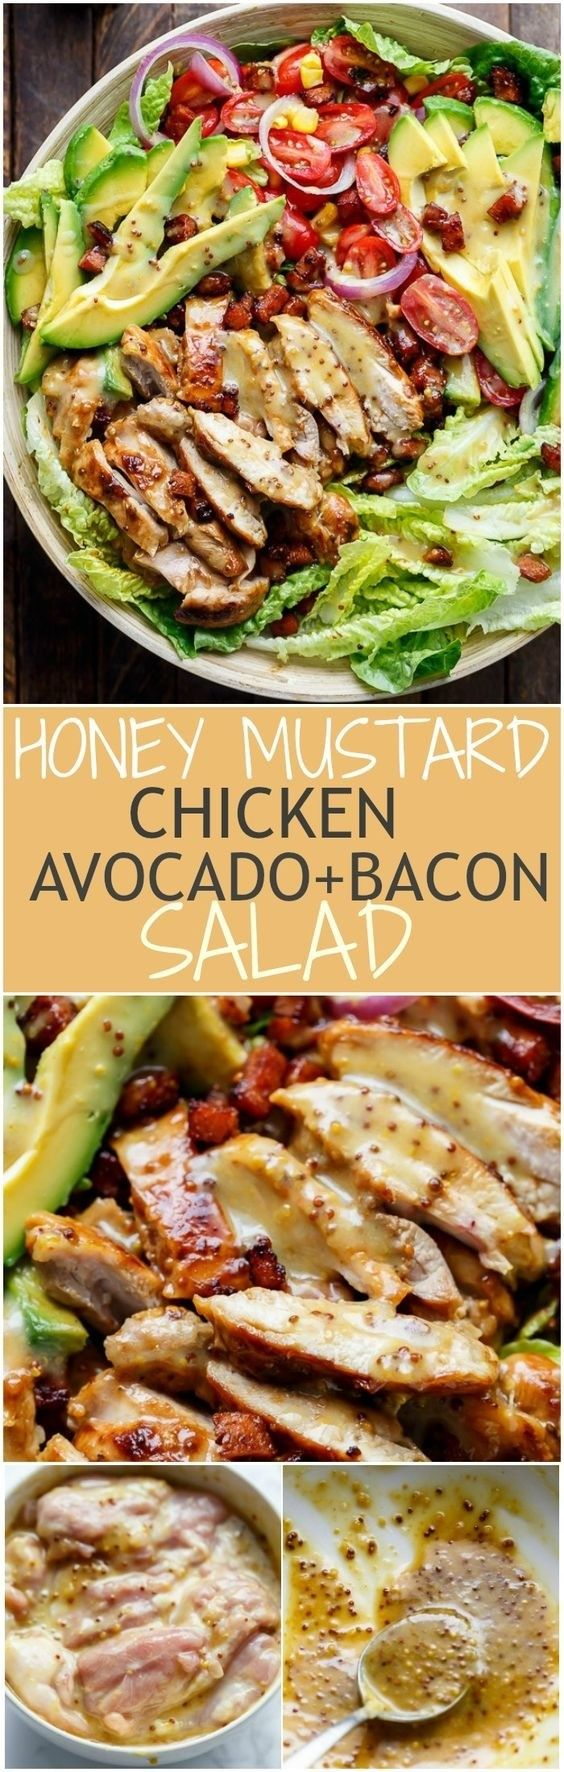 Honey Mustard Chicken, Avocado, and Bacon Salad